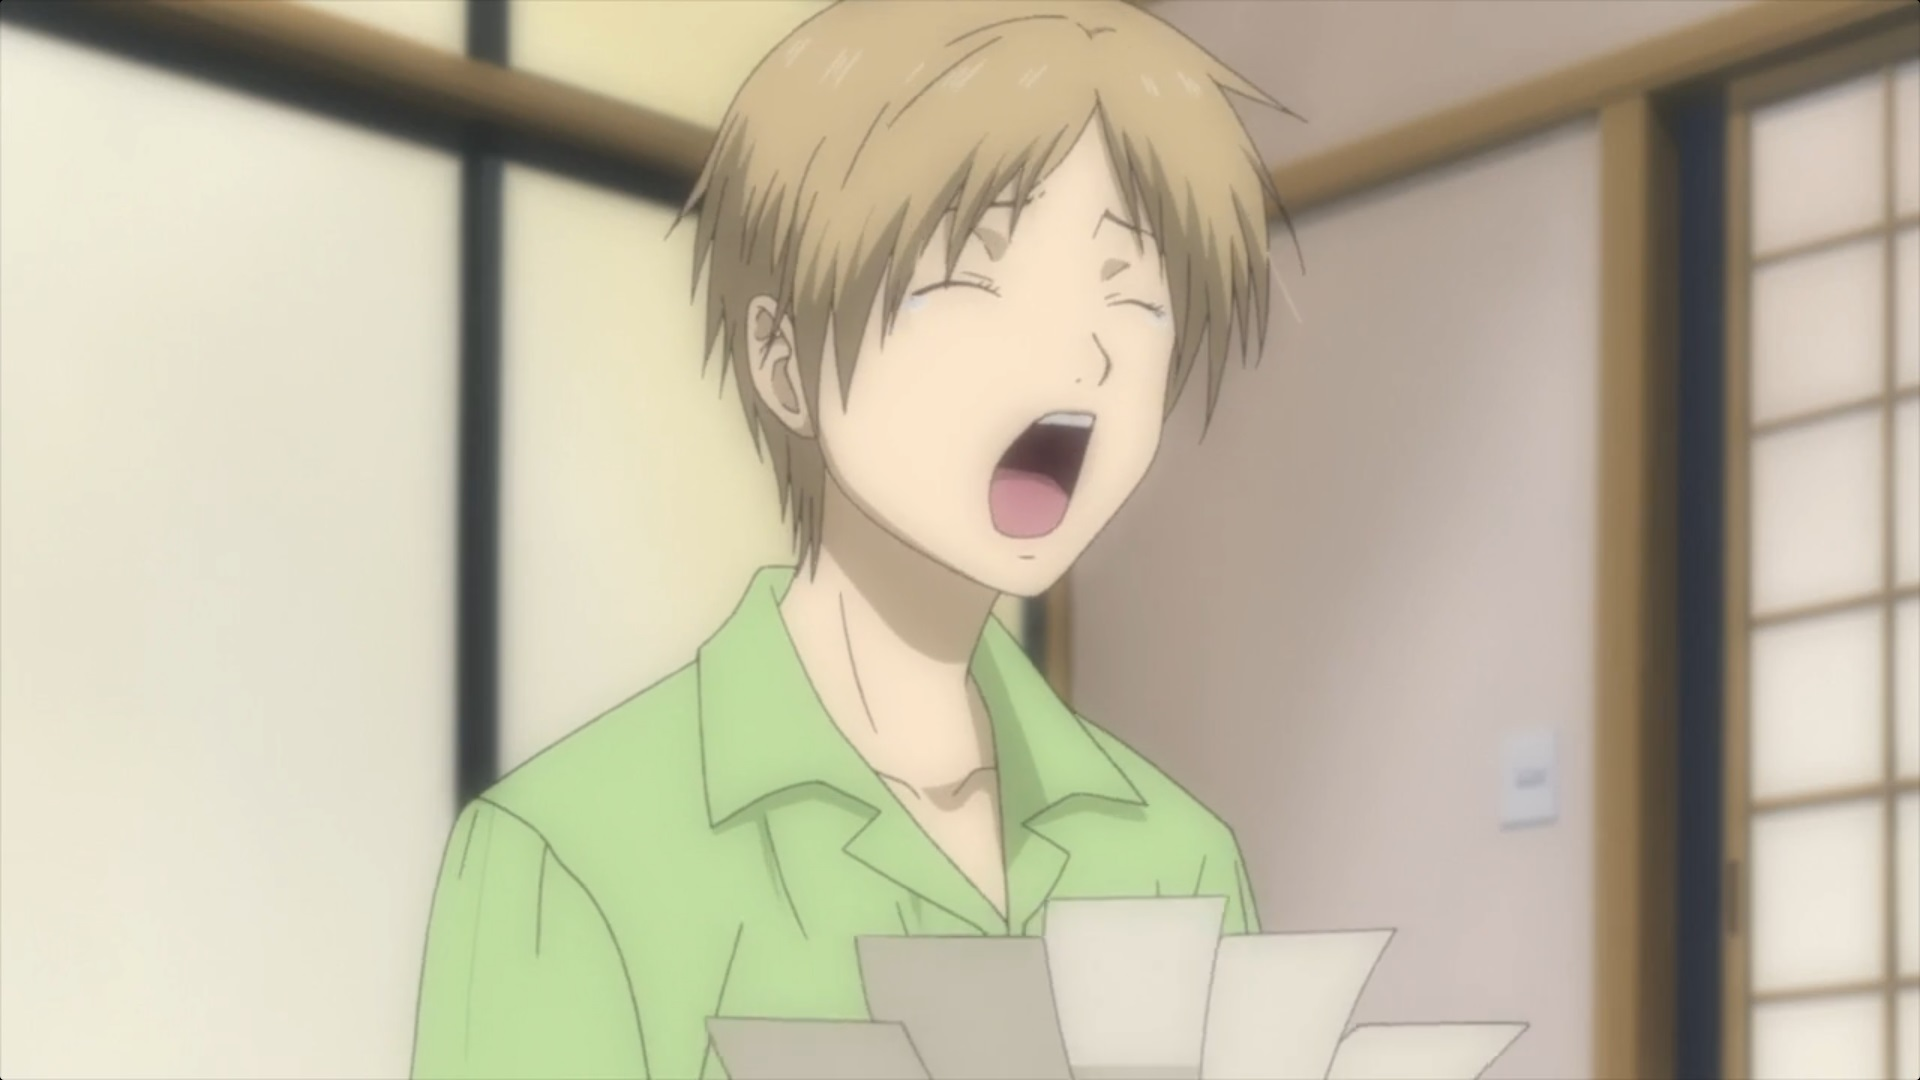 File:Natsume-ich-sleepy.jpg